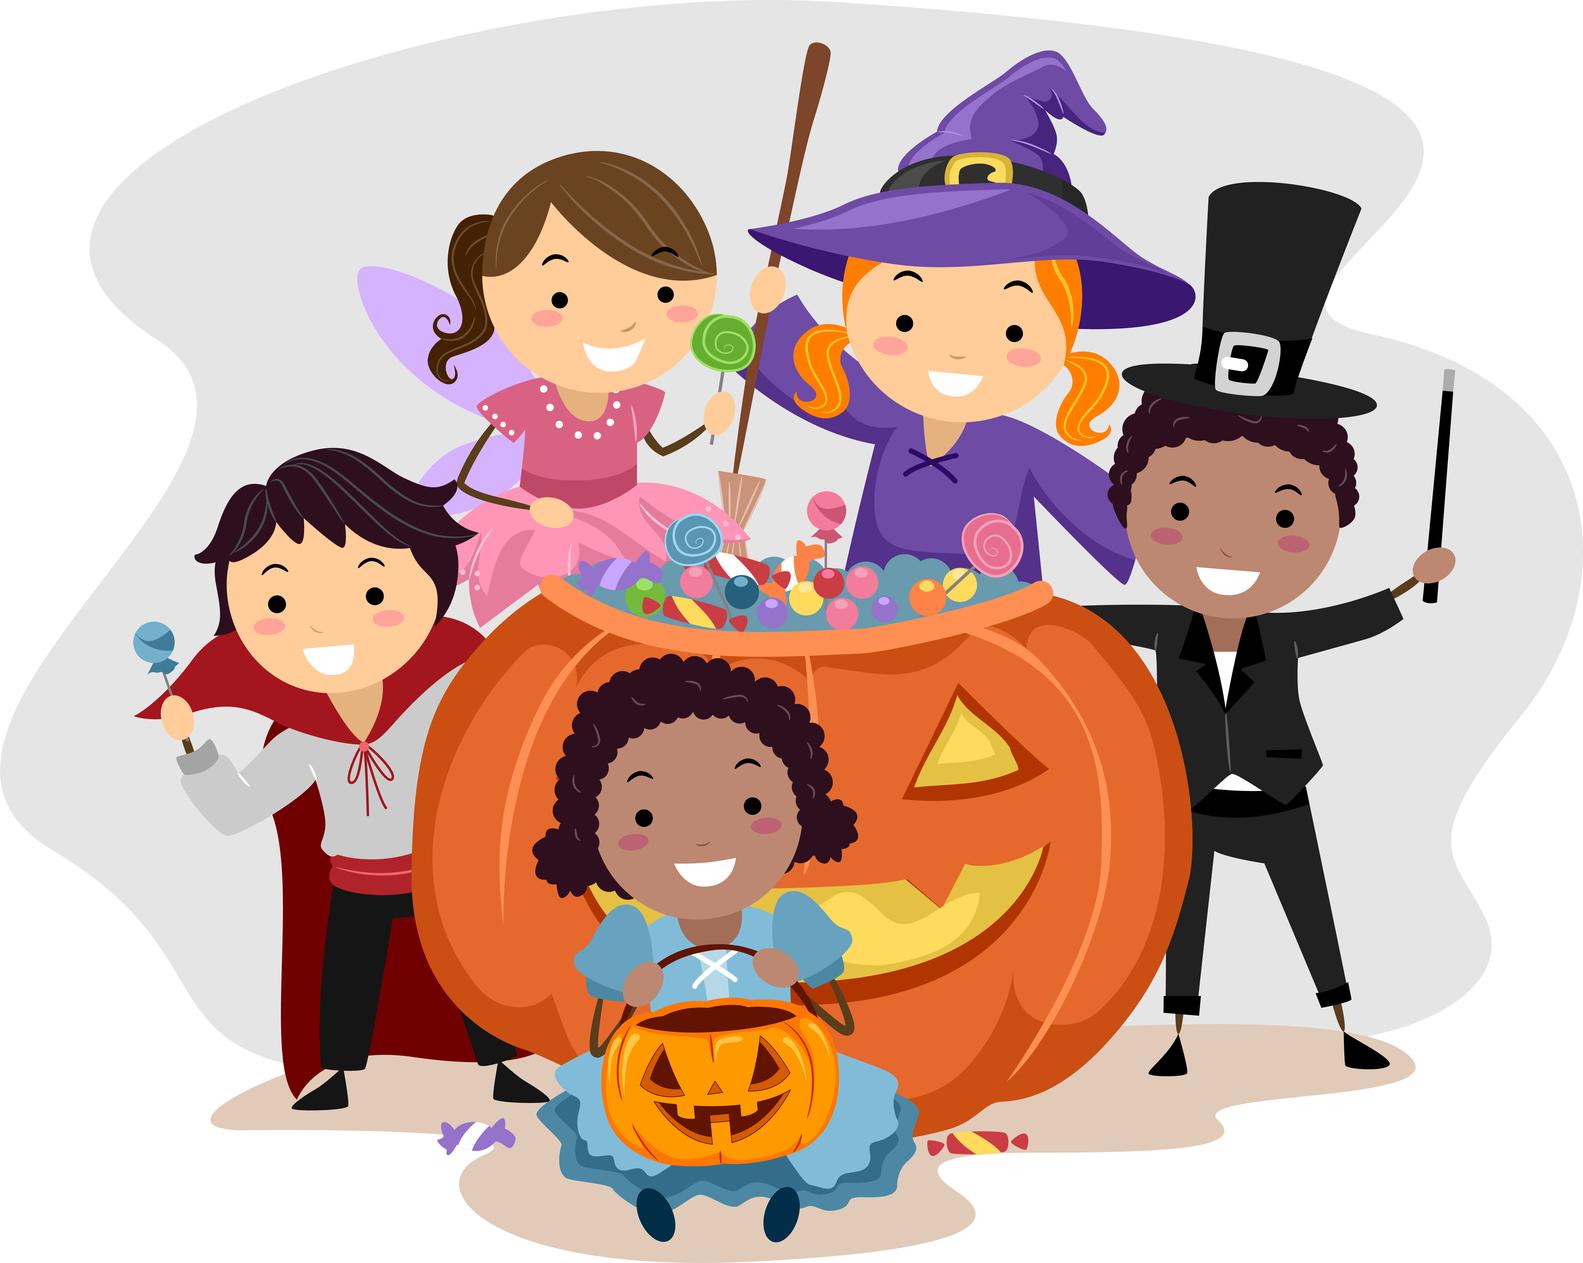 Costume clipart halloween child Creative costume for Costume kids